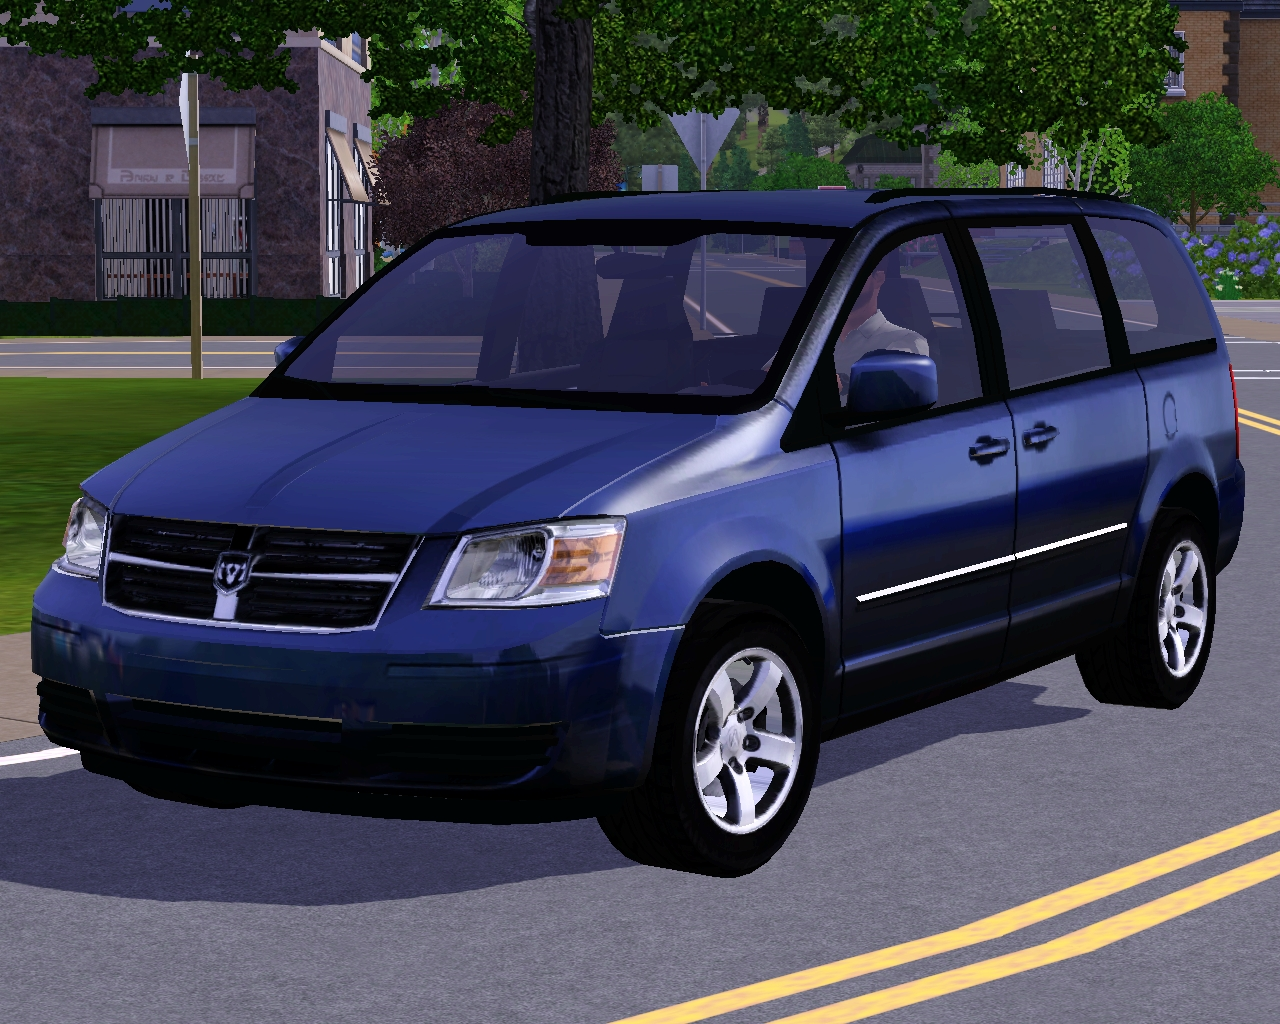 my sims 3 blog 2010 dodge grand caravan by fresh prince. Black Bedroom Furniture Sets. Home Design Ideas